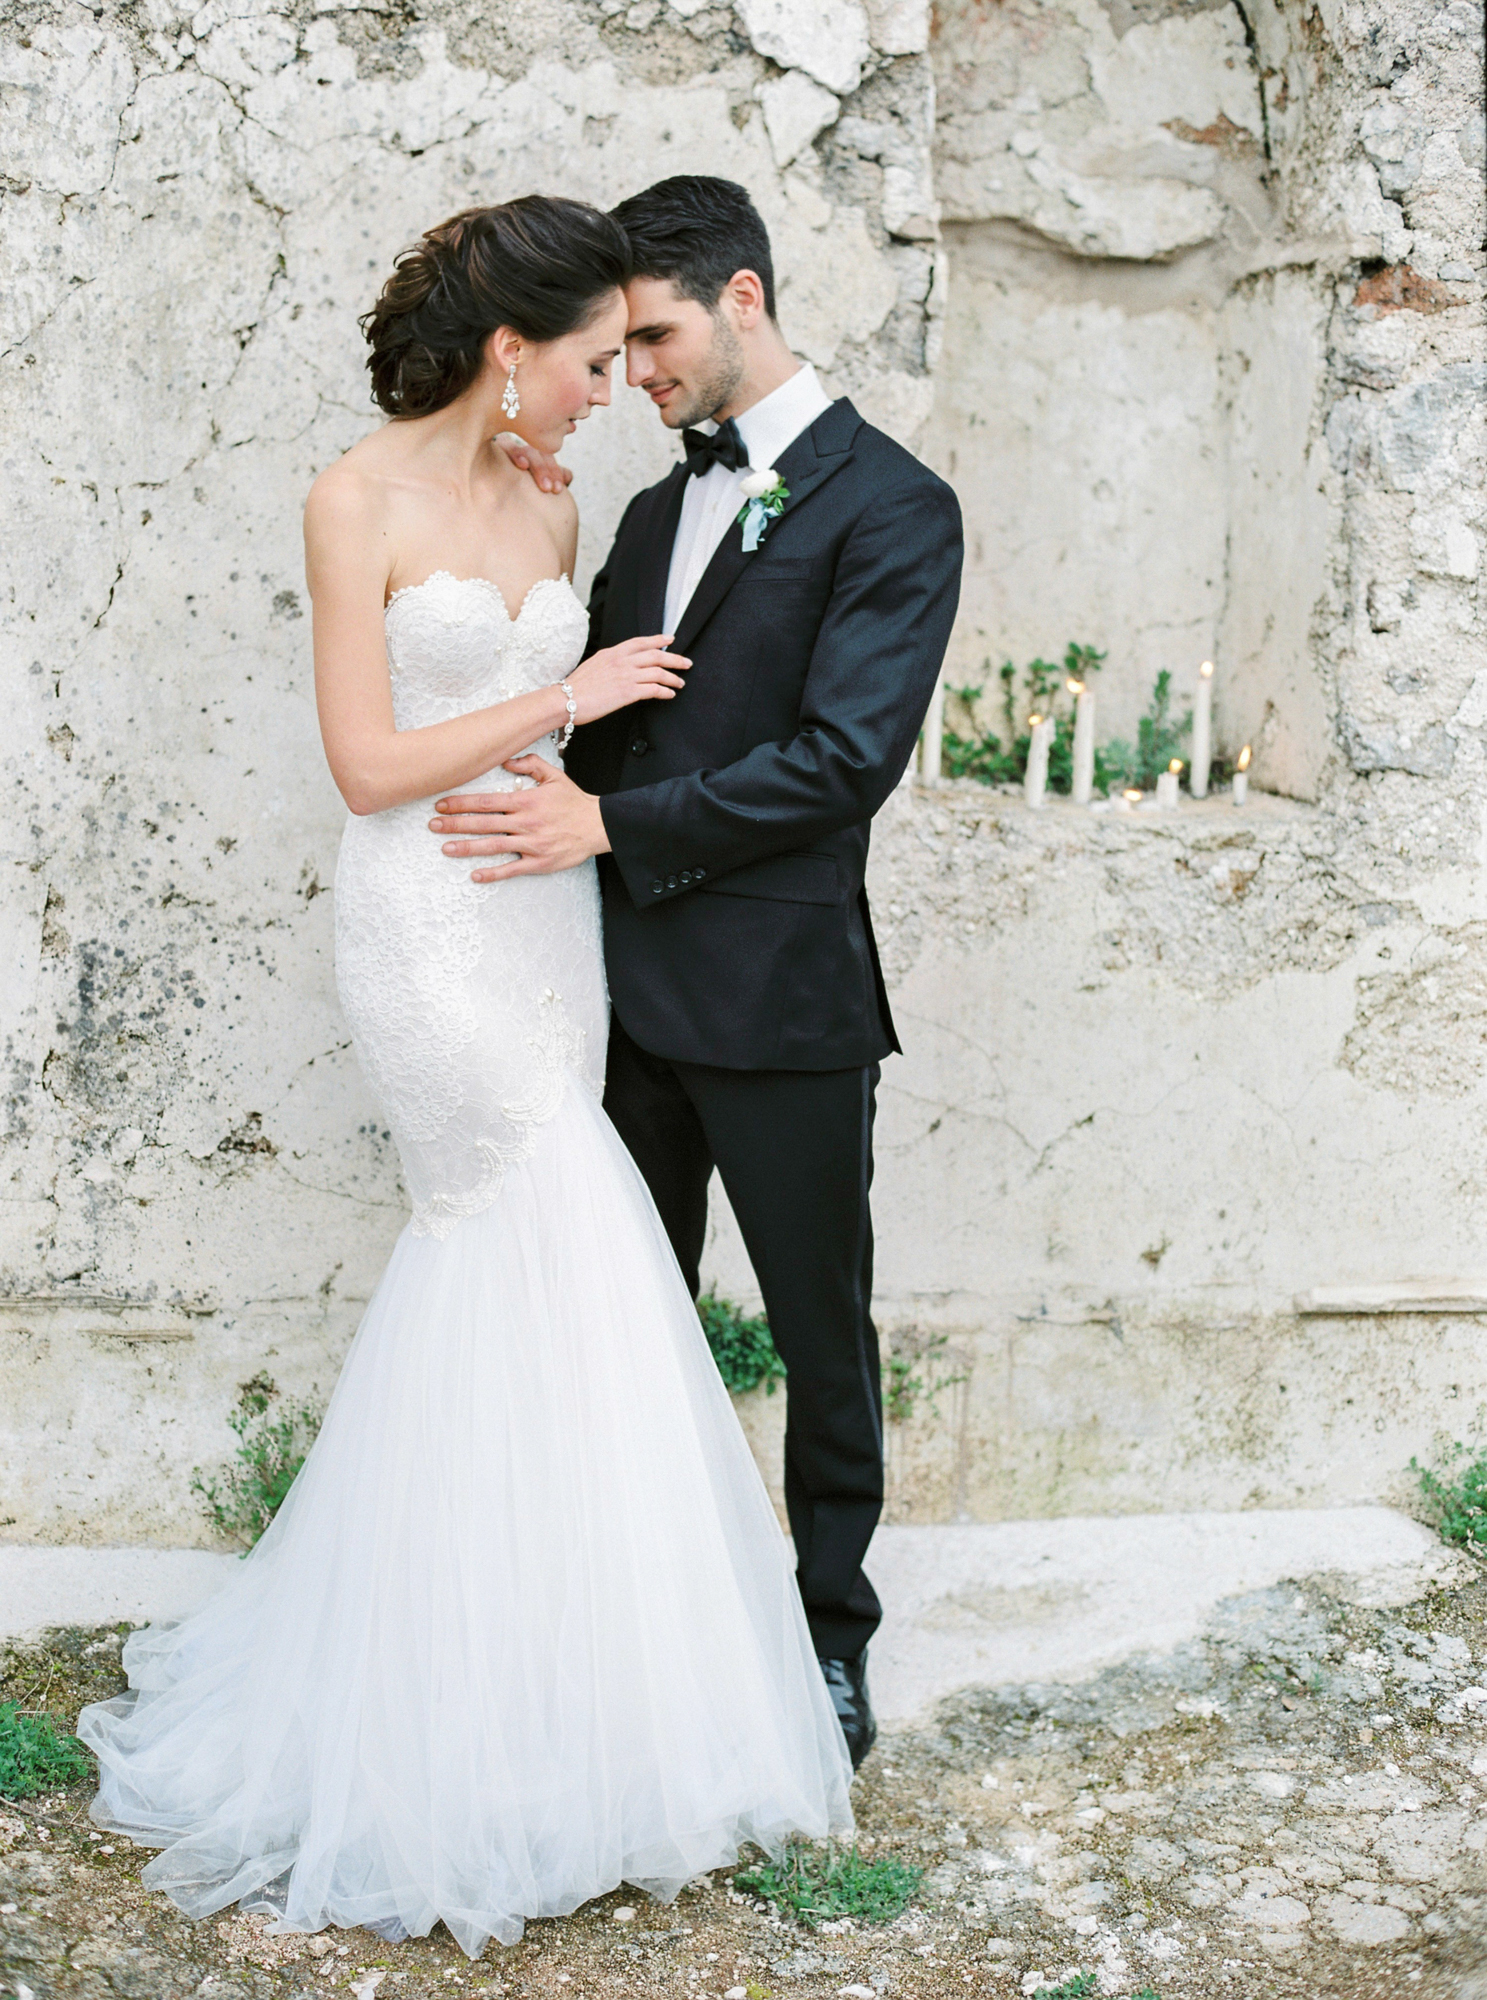 Destination Wedding Photographer _ wedding photography _ film photography _ europe wedding photographer _ love is my favorite color_-32.jpg